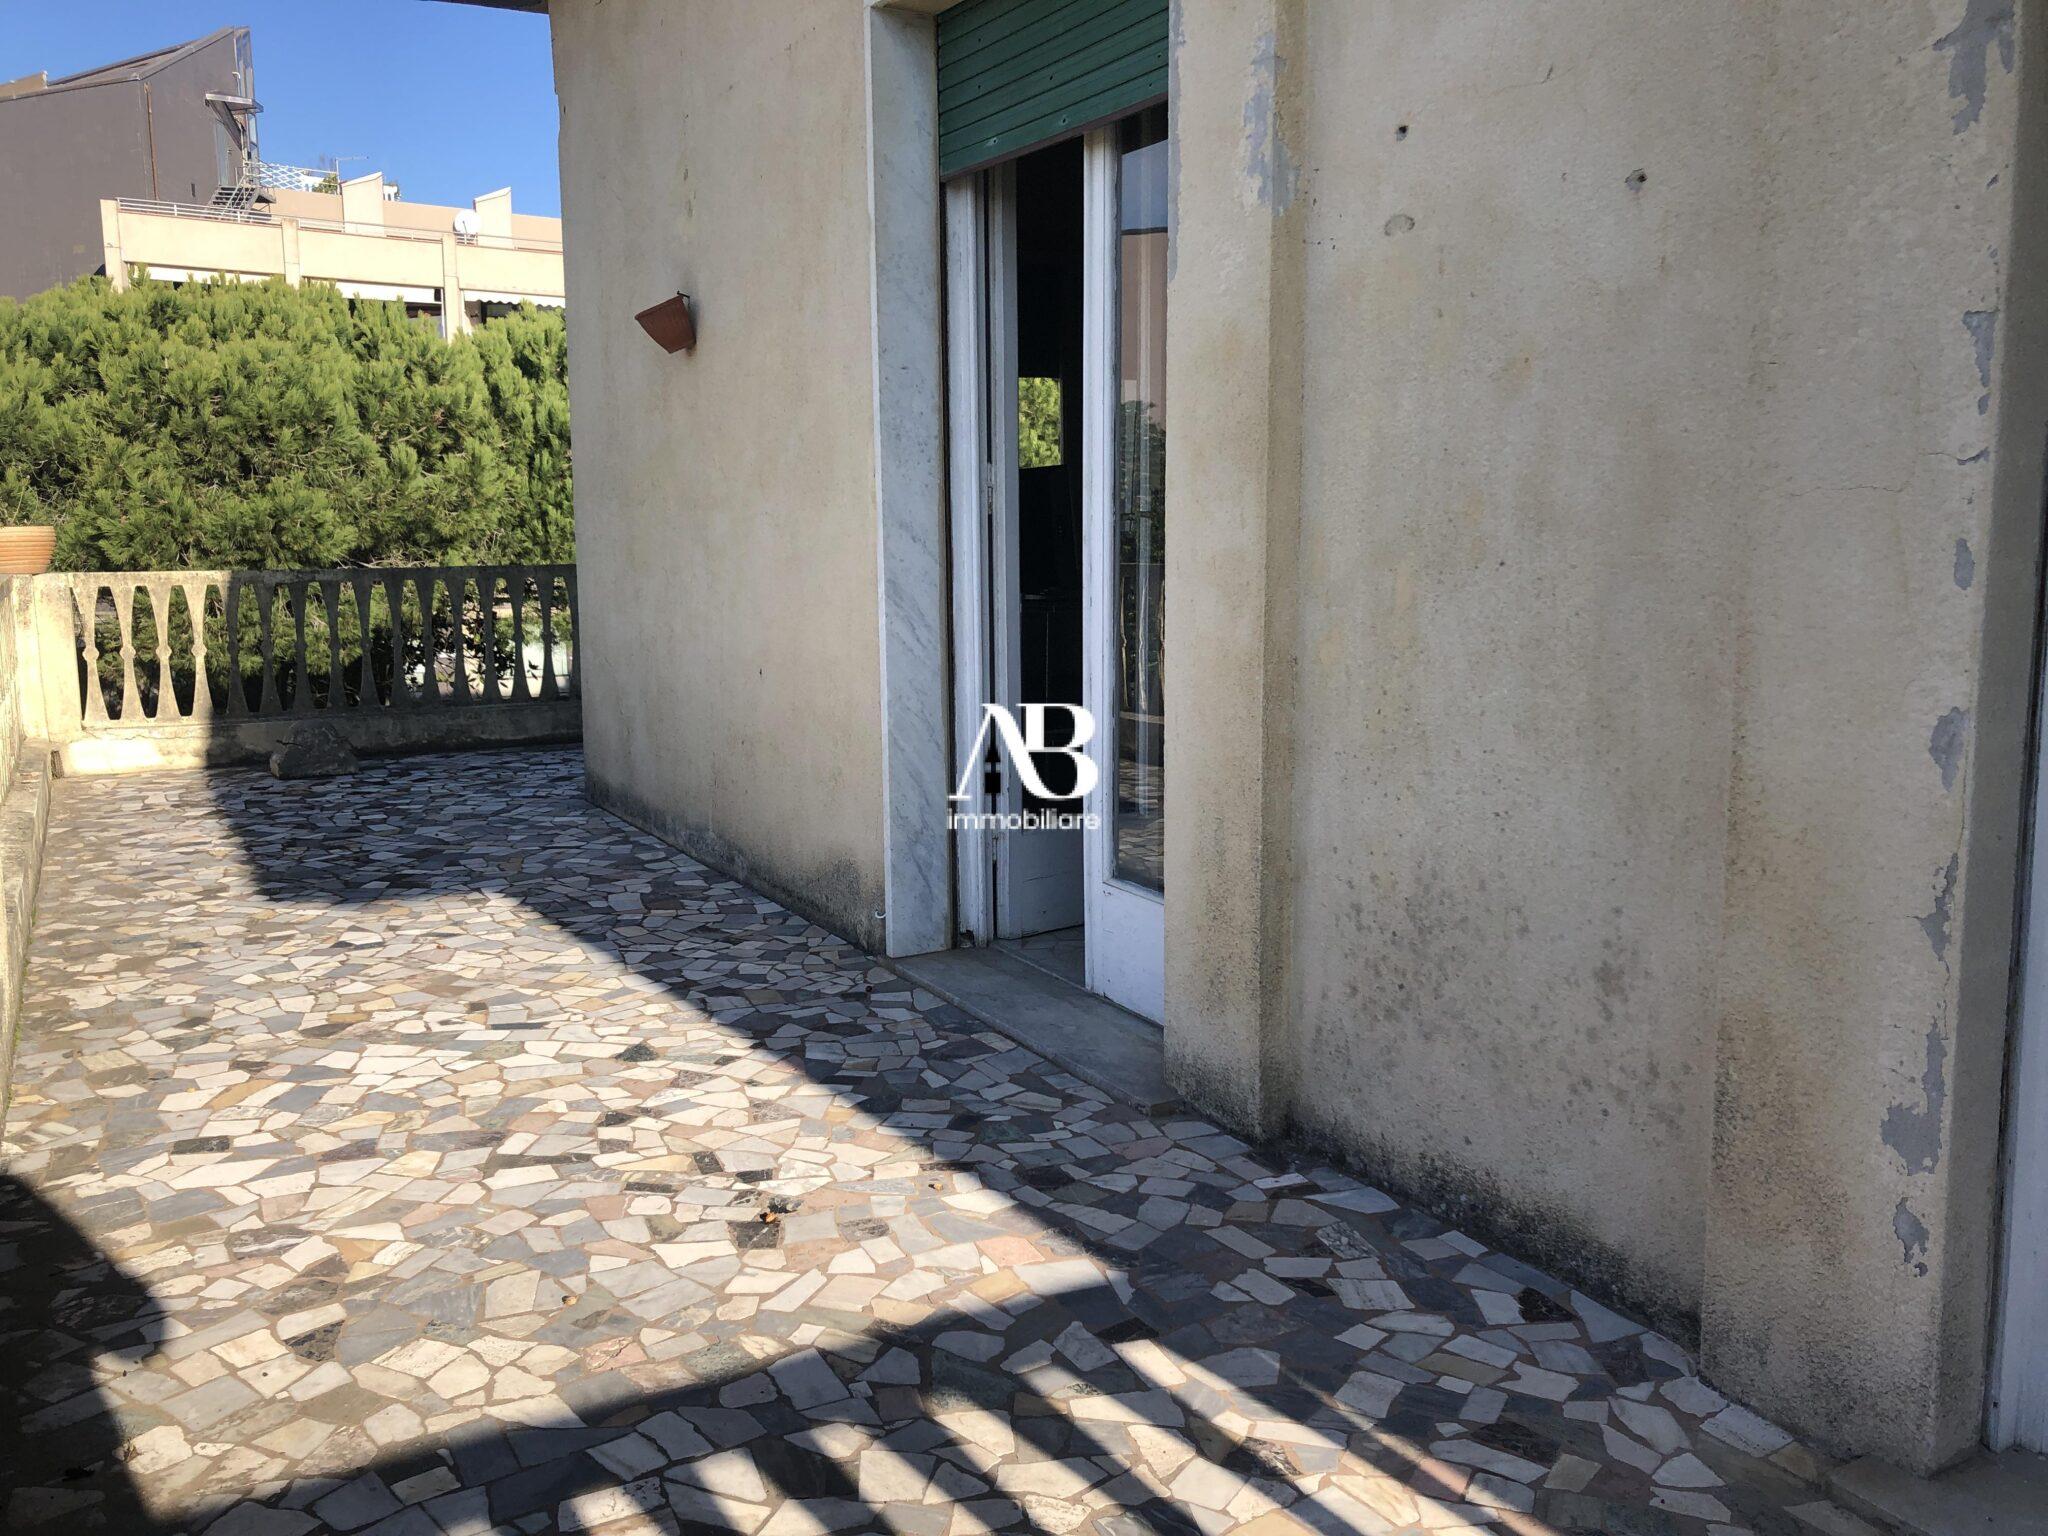 Villa fronte mare con dependance